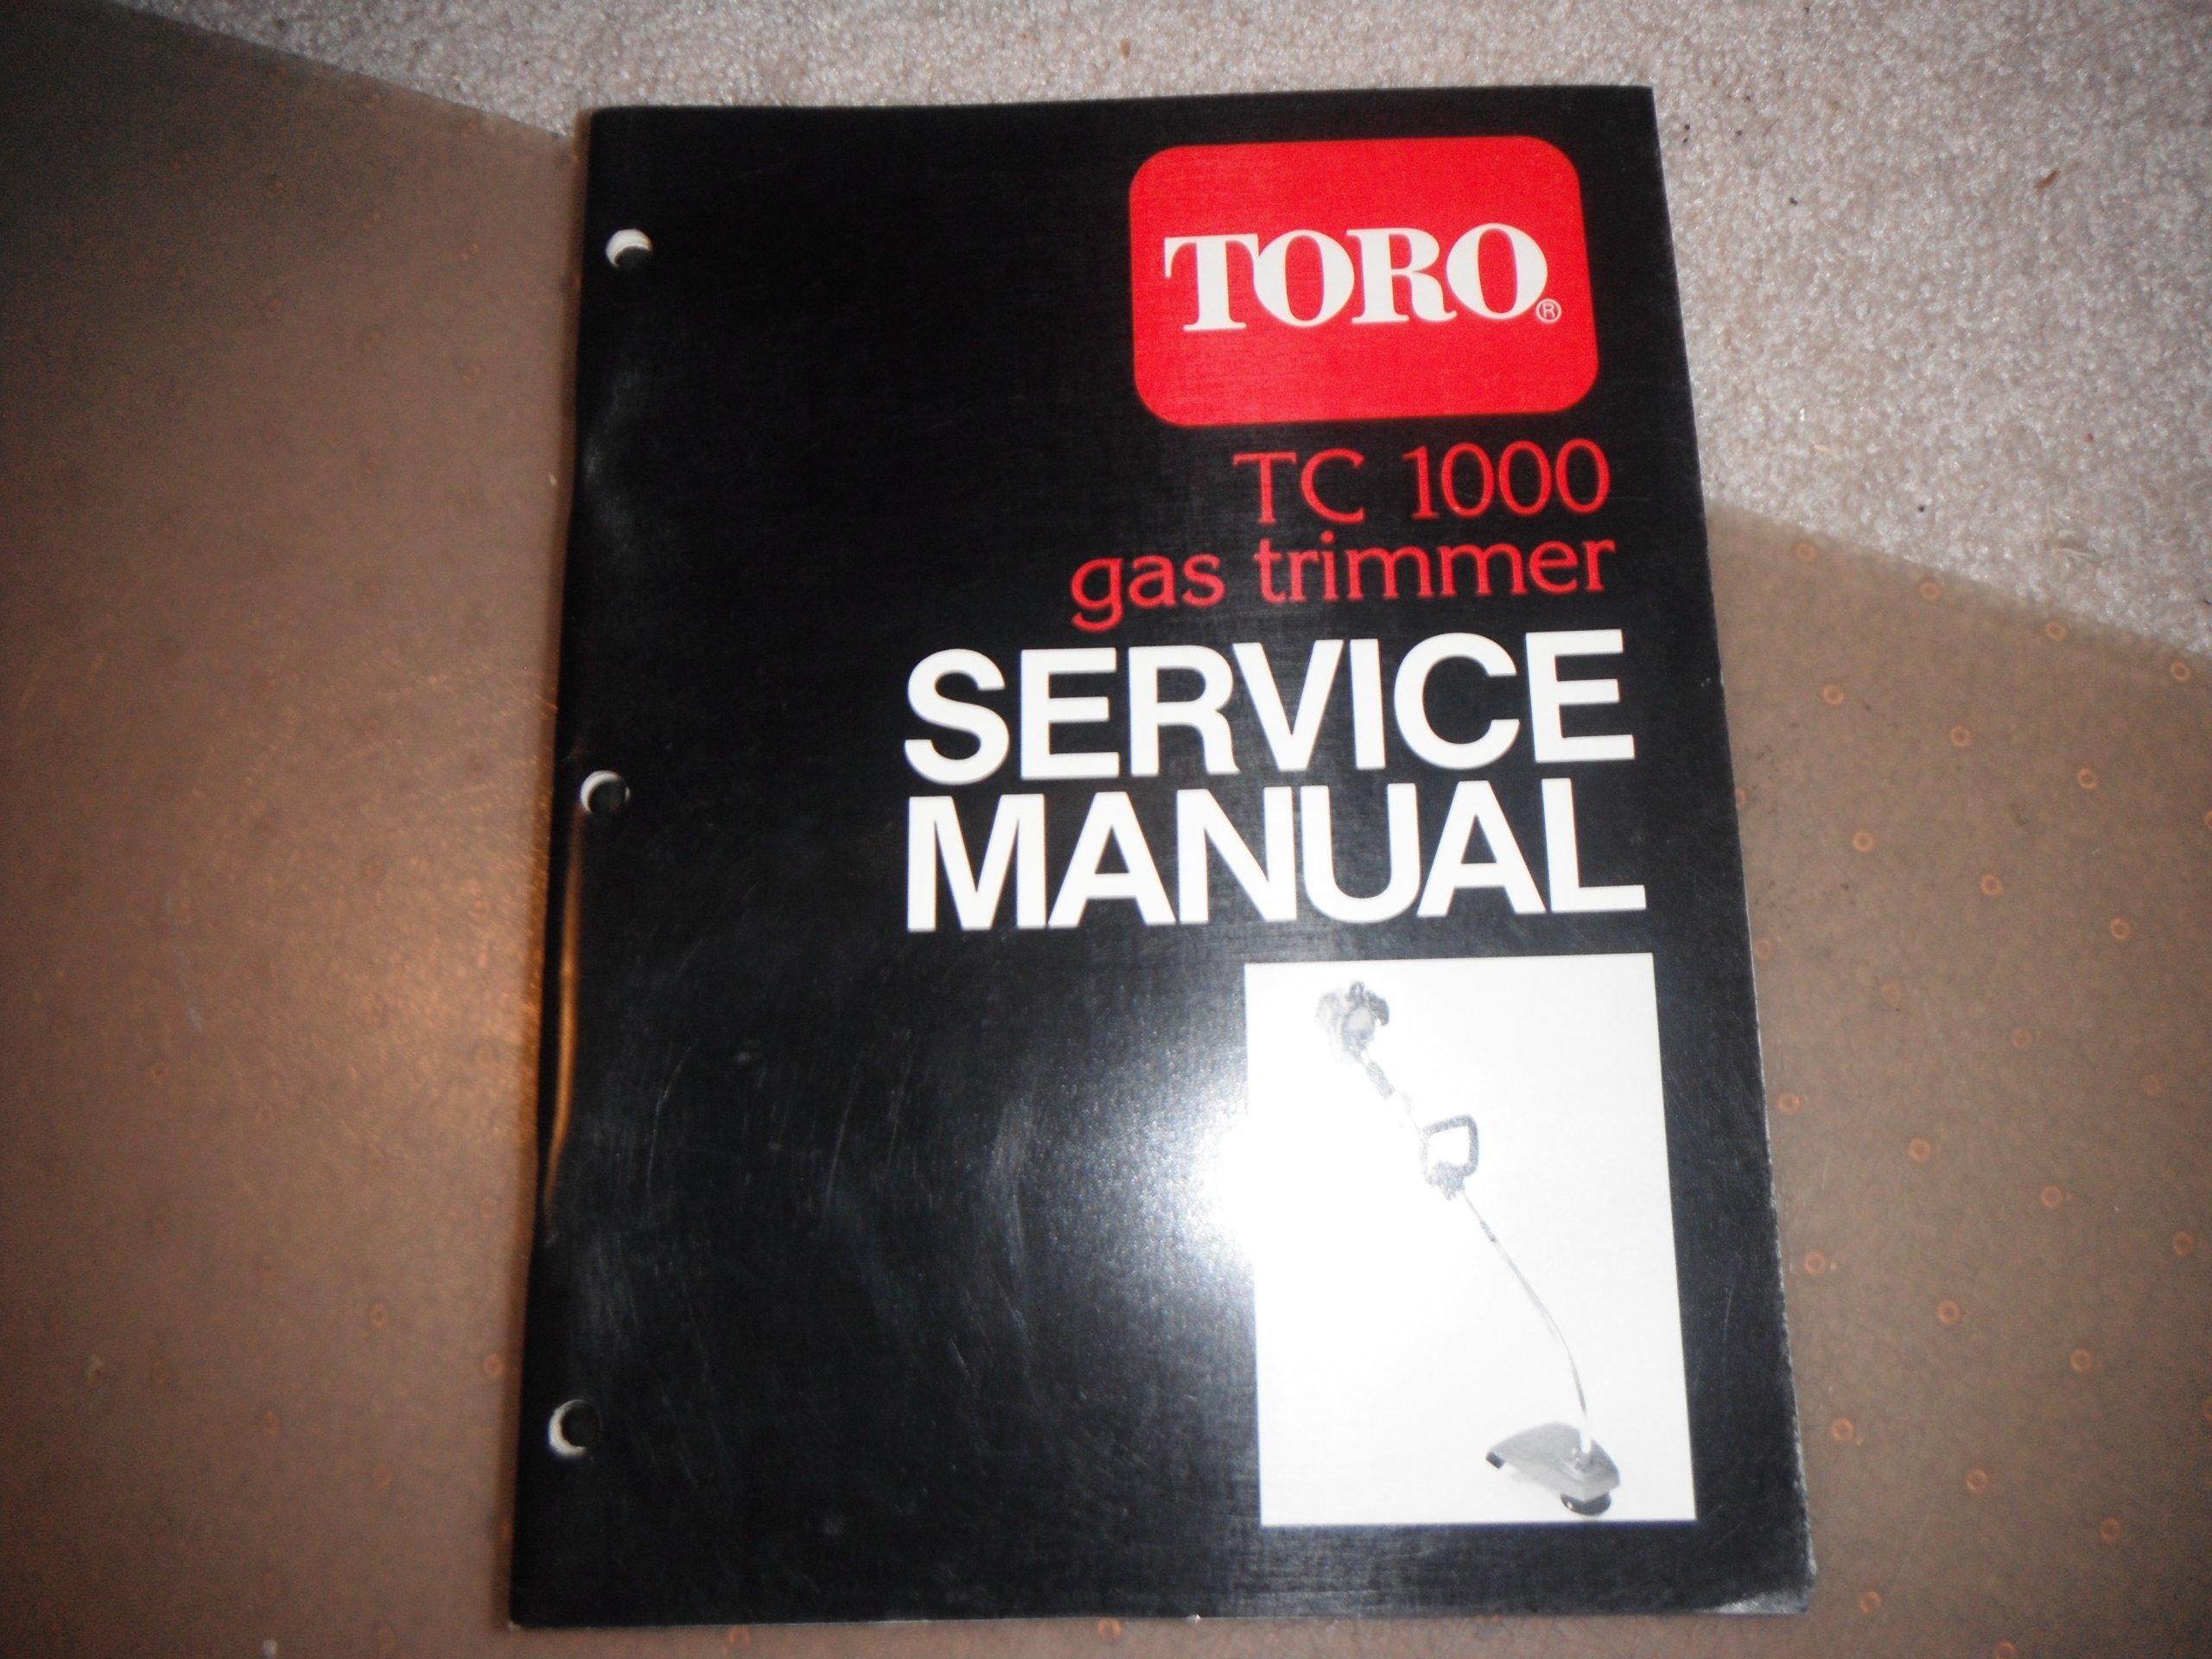 Toro gas trimmer manual toro tc1000 gas trimmer service manual array toro tc 1000 gas trimmer service manual 1987 toro corporation rh amazon com fandeluxe Images